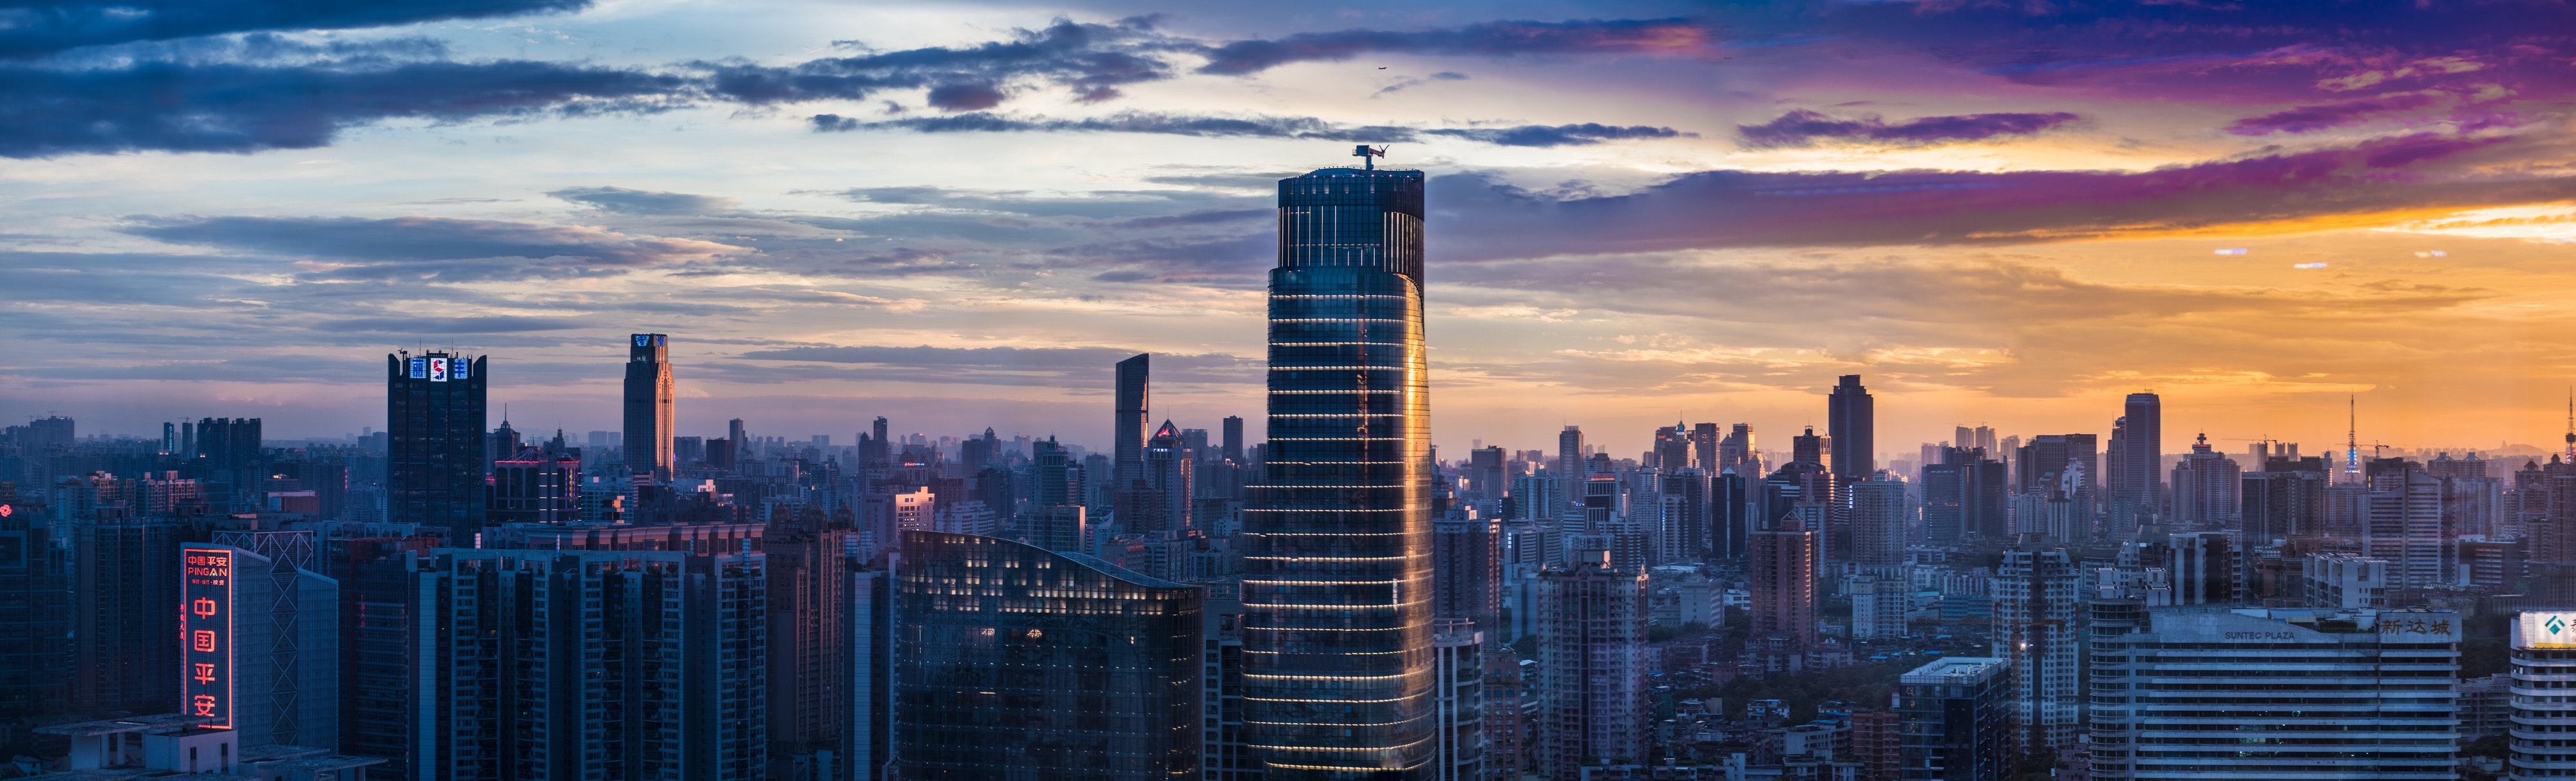 1000+ Amazing Cityscape Photos · Pexels · Free Stock Photos